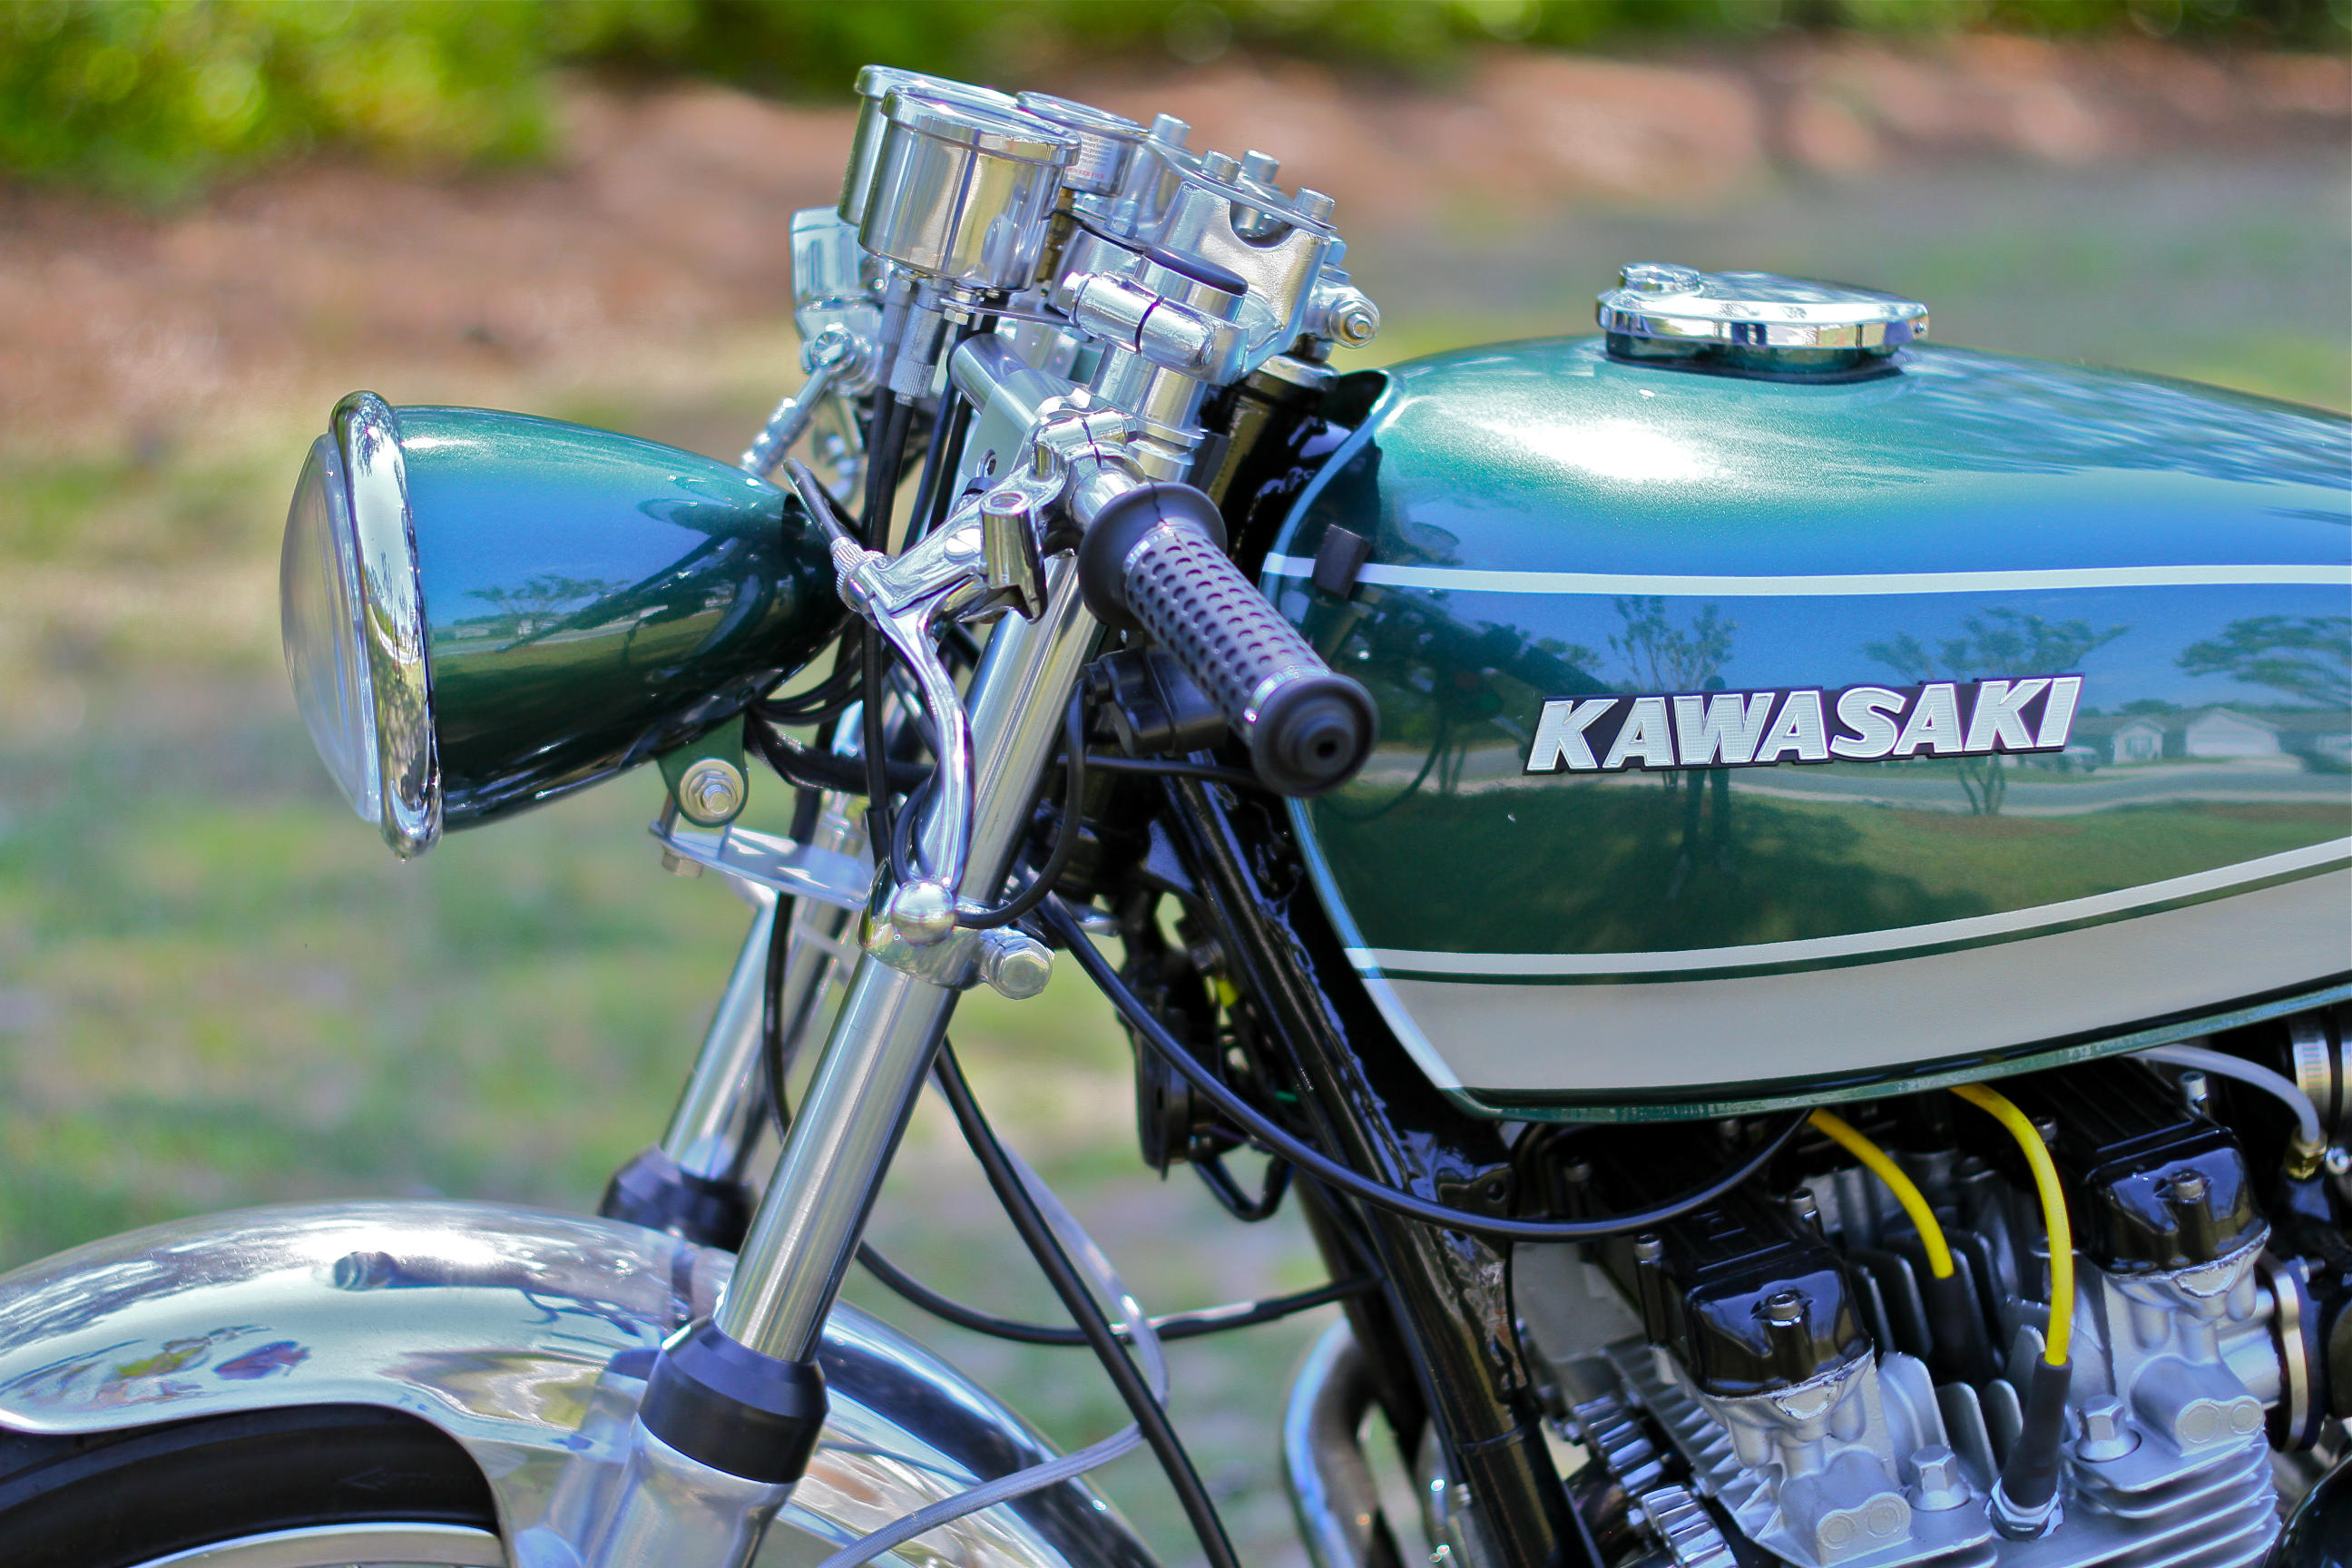 Kawasaki KZ650 Turbo - $12,000